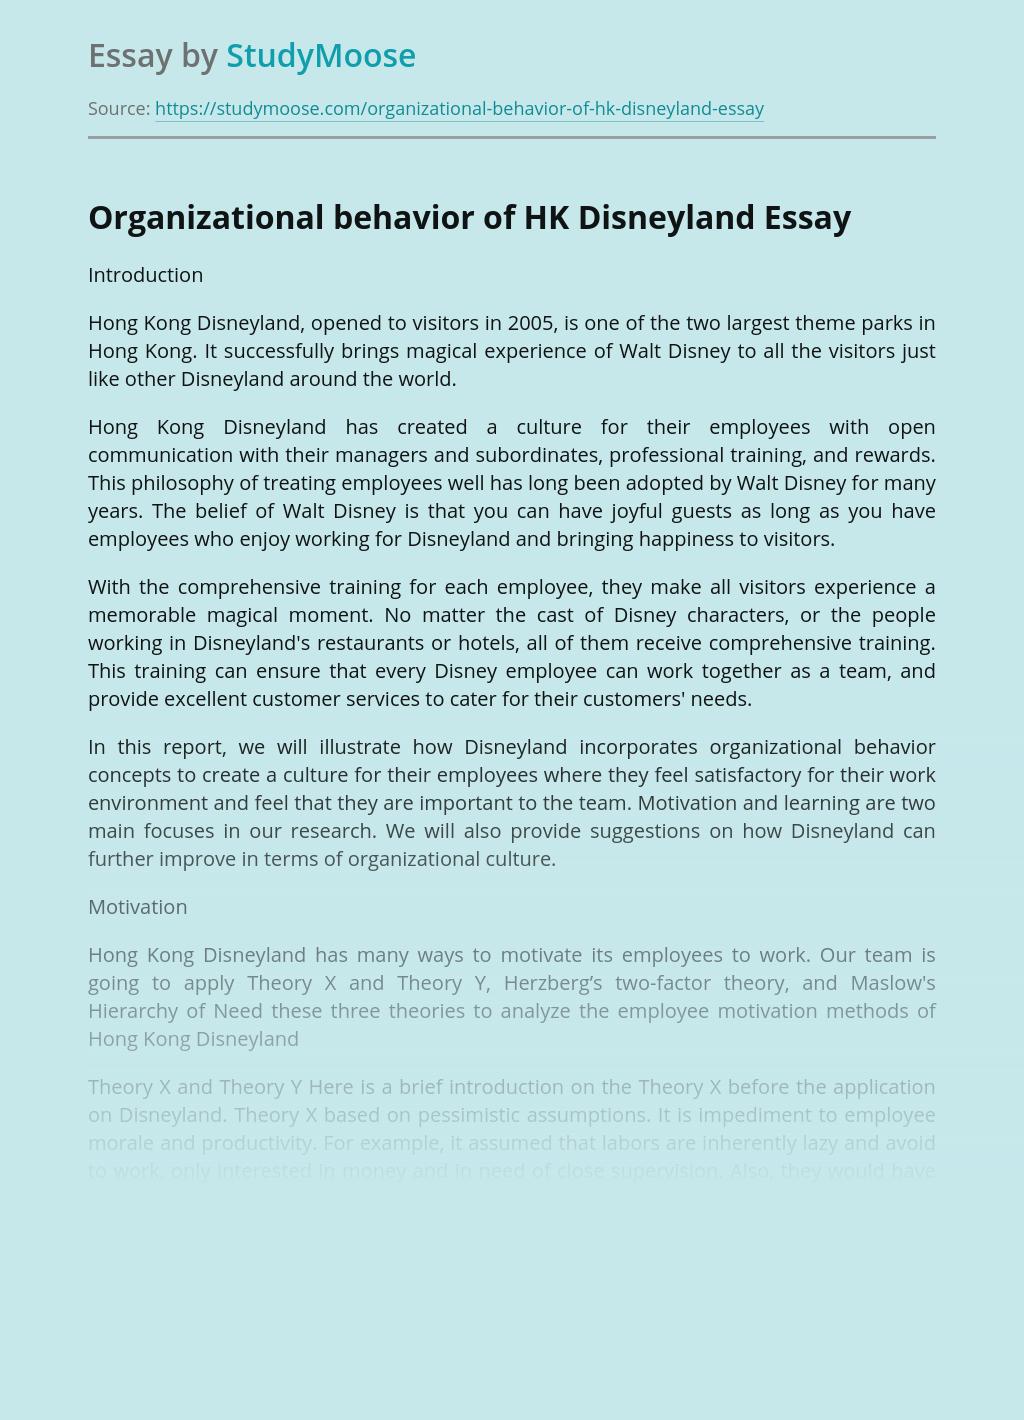 Organizational behavior of HK Disneyland